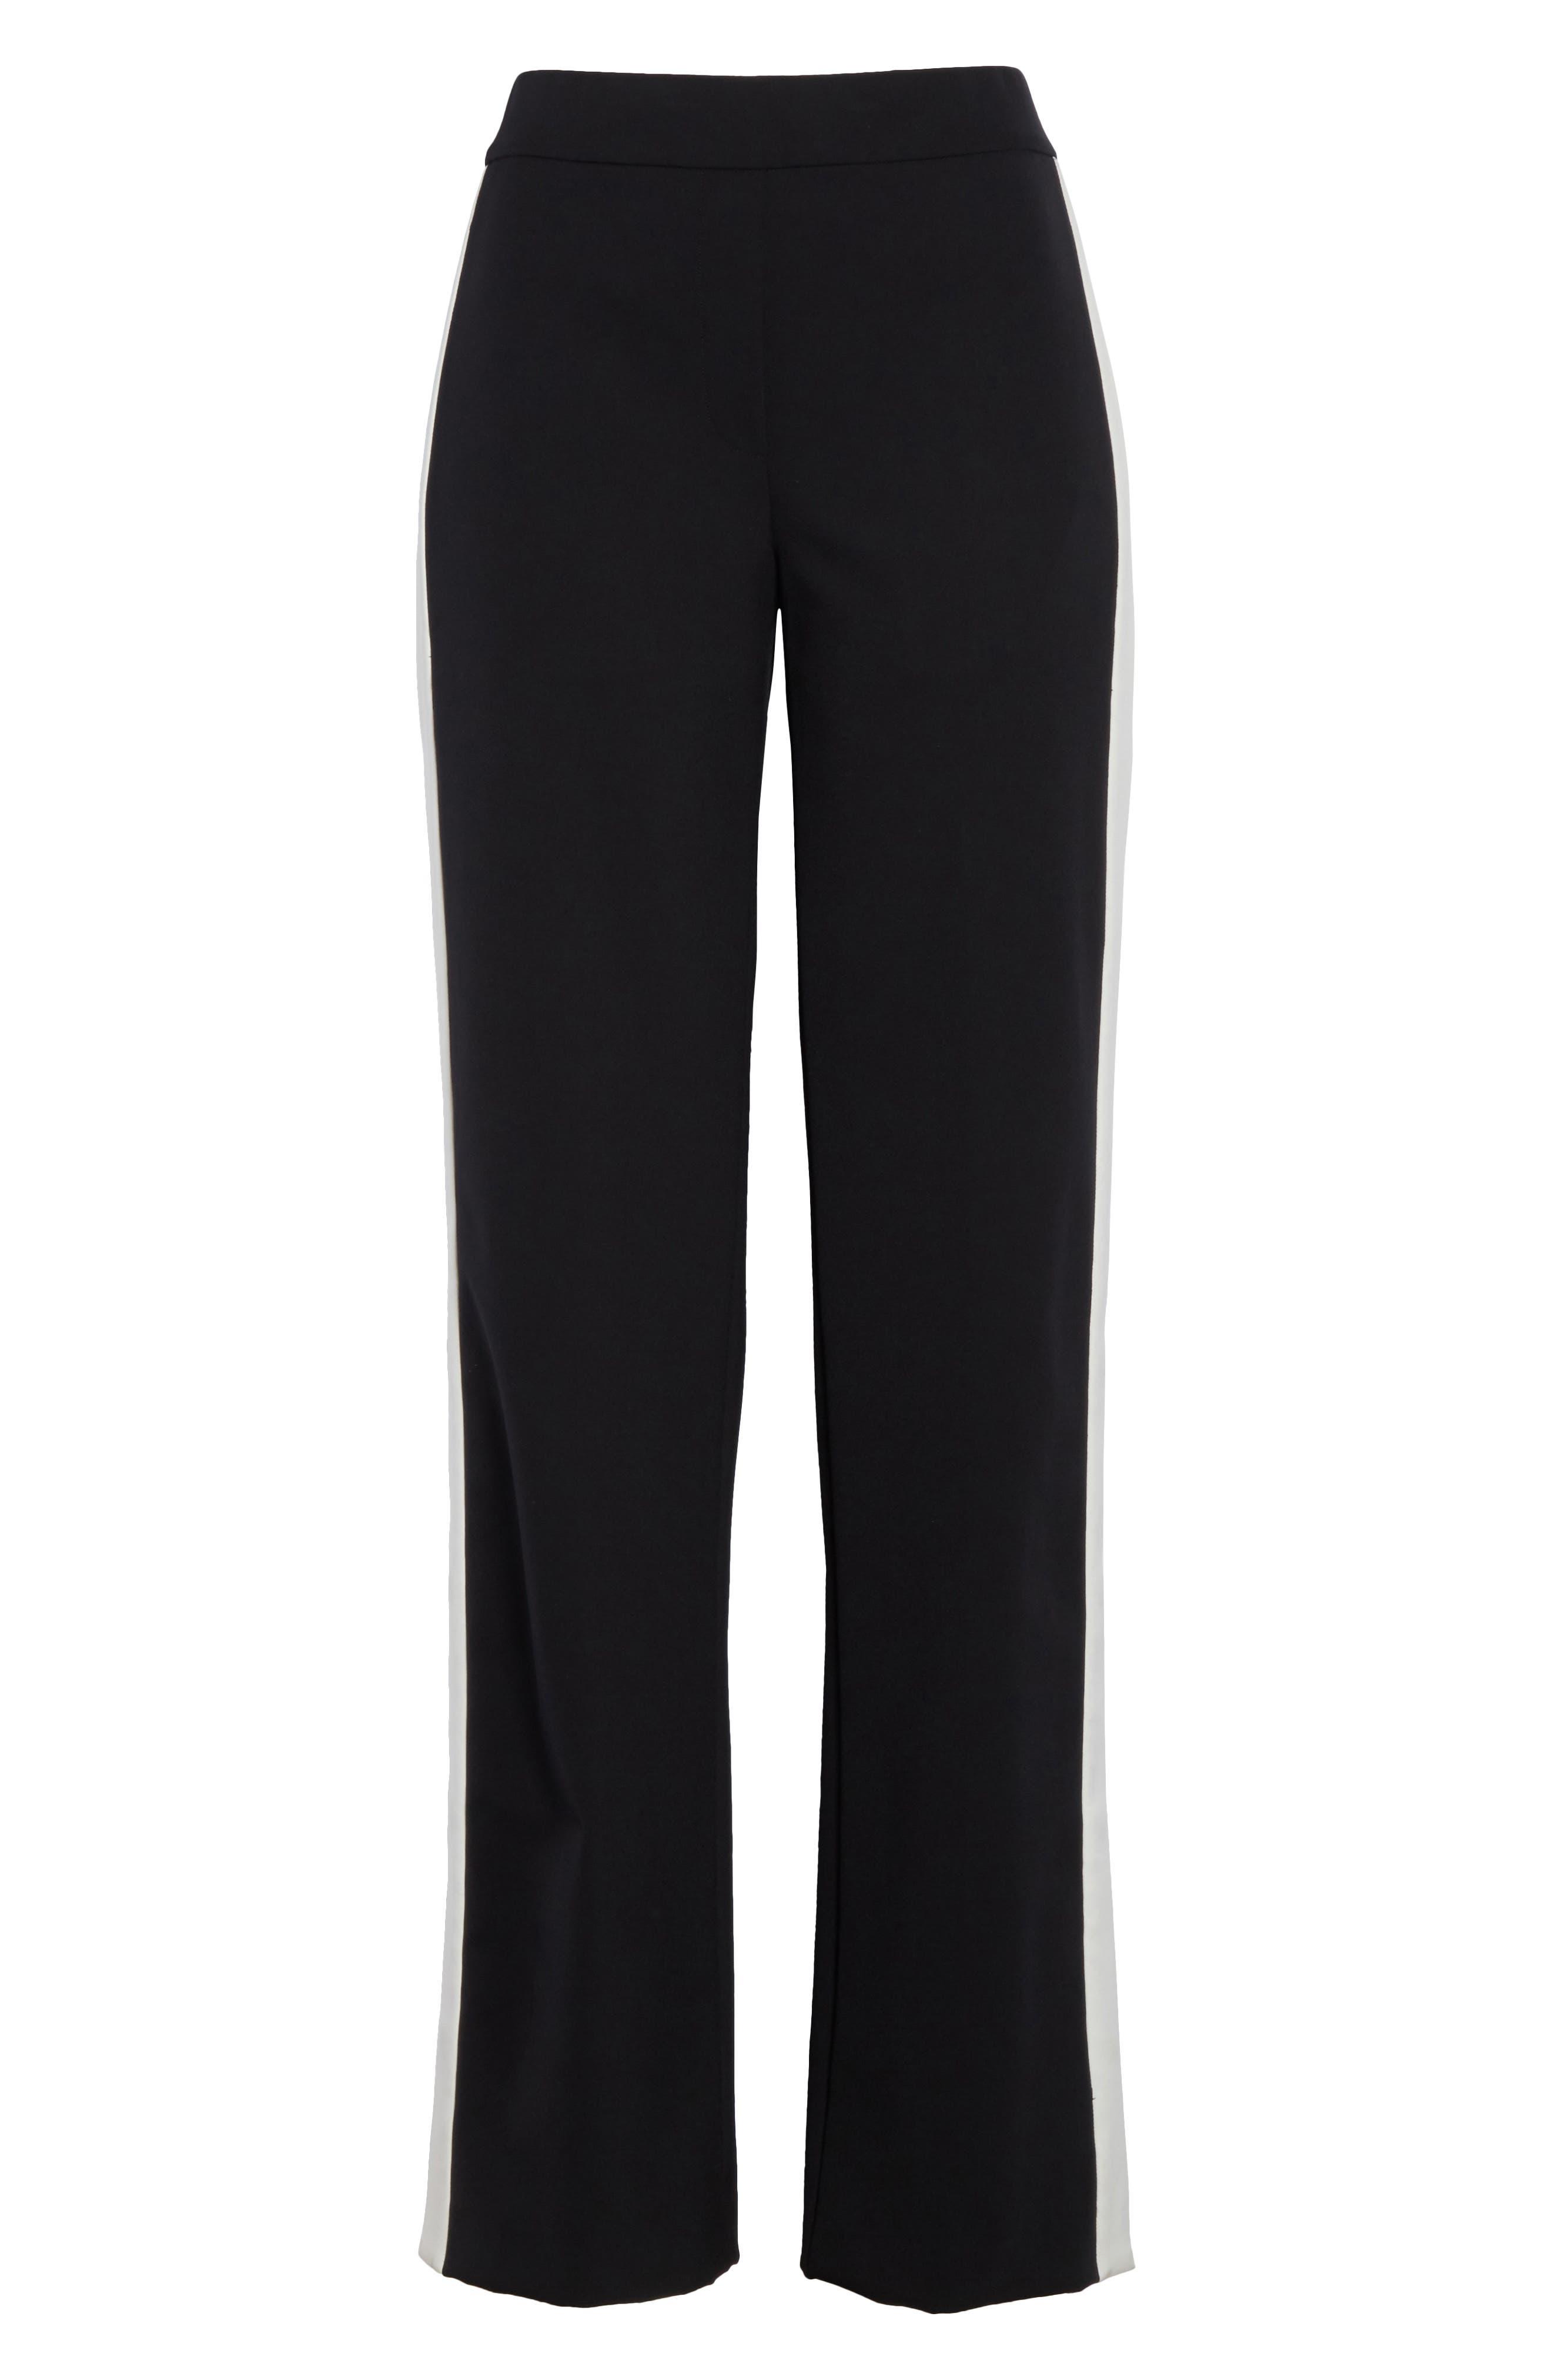 Snap Side Track Pants,                             Alternate thumbnail 6, color,                             Black/ Ivory